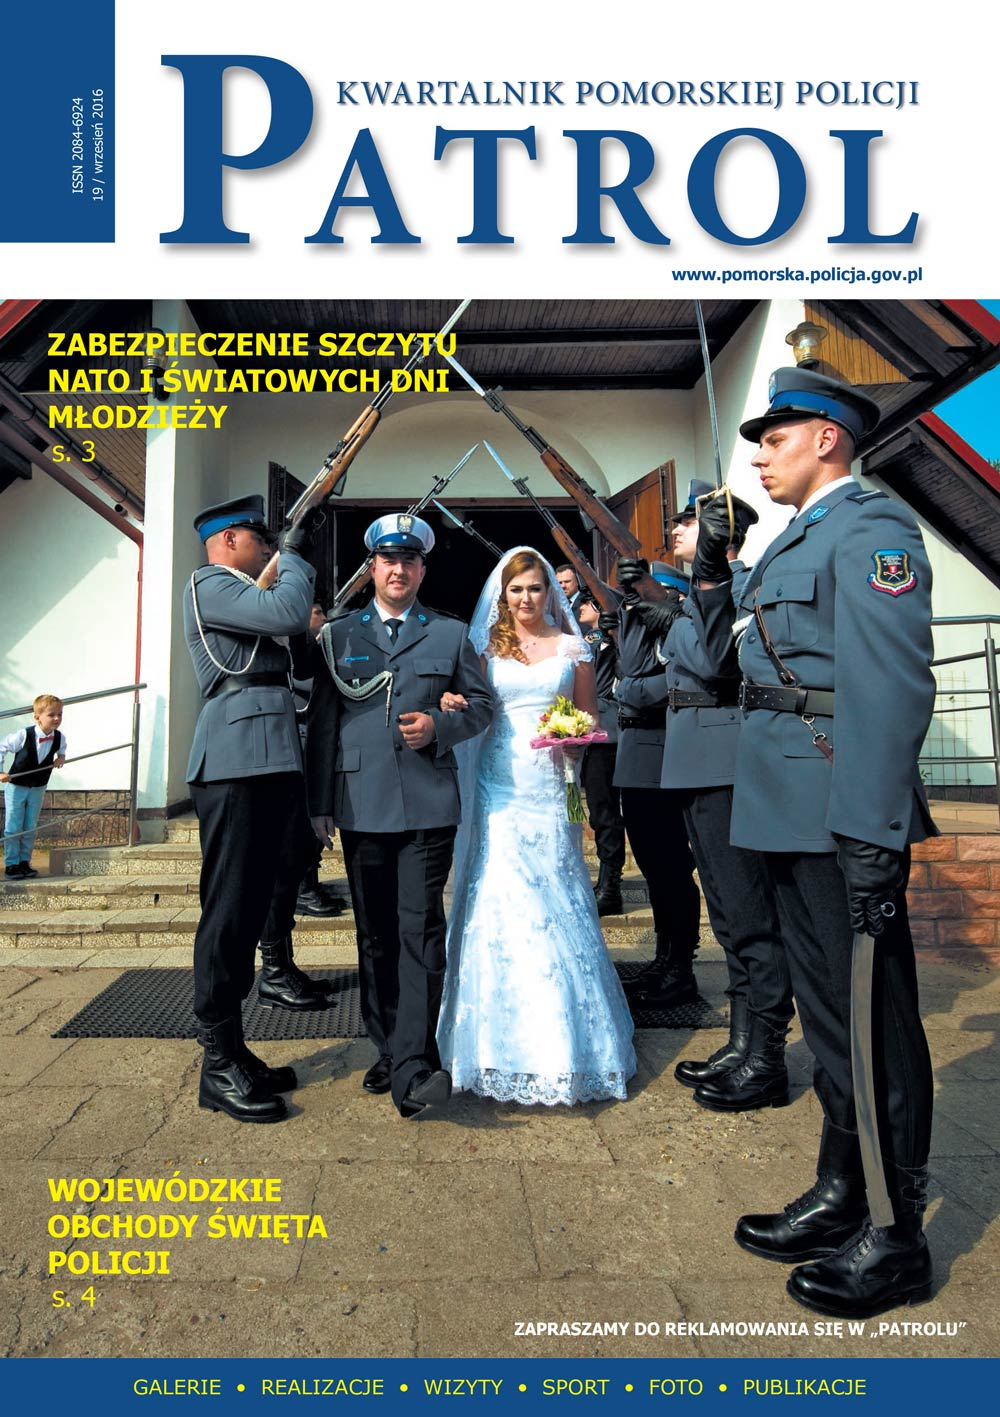 [2016, 03] PATROL. KWARTALNIK POMORSKIEJ POLICJI. - 2016, [nr] 19 / wrzesień, www.pomorska.policja.gov.pl